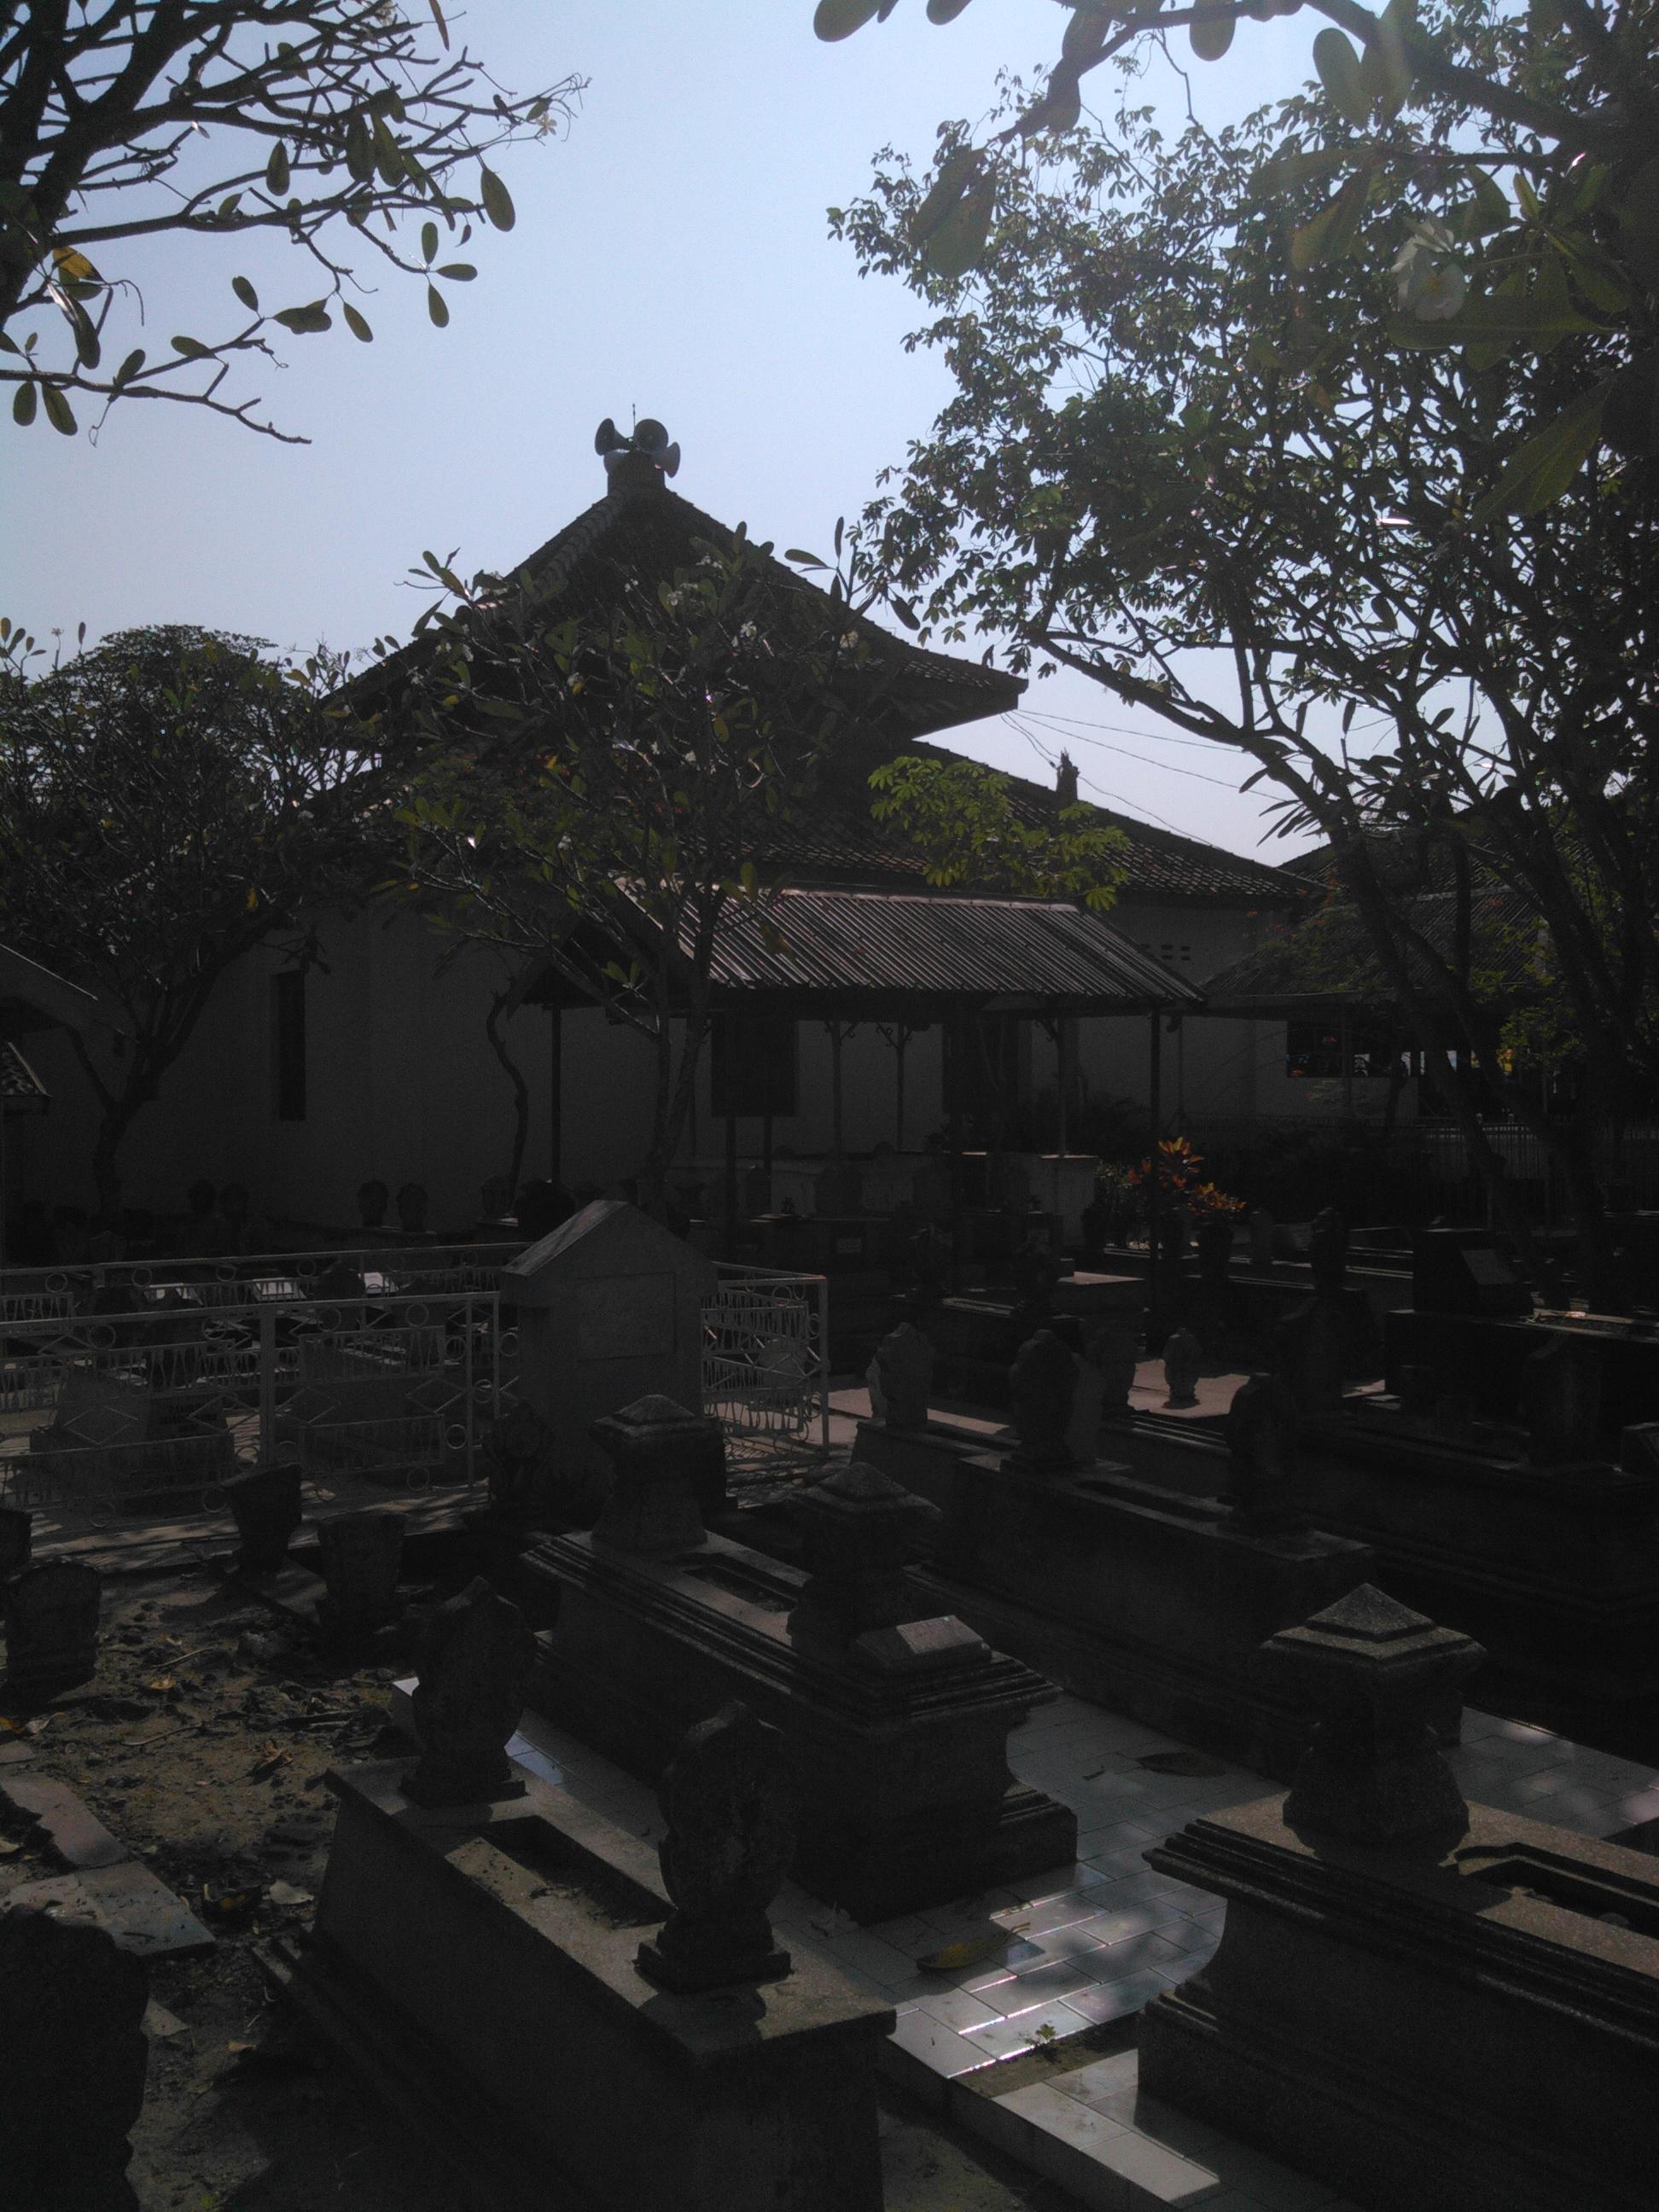 Masjid Kuno Kuncen Makam Kno Kab Madiun